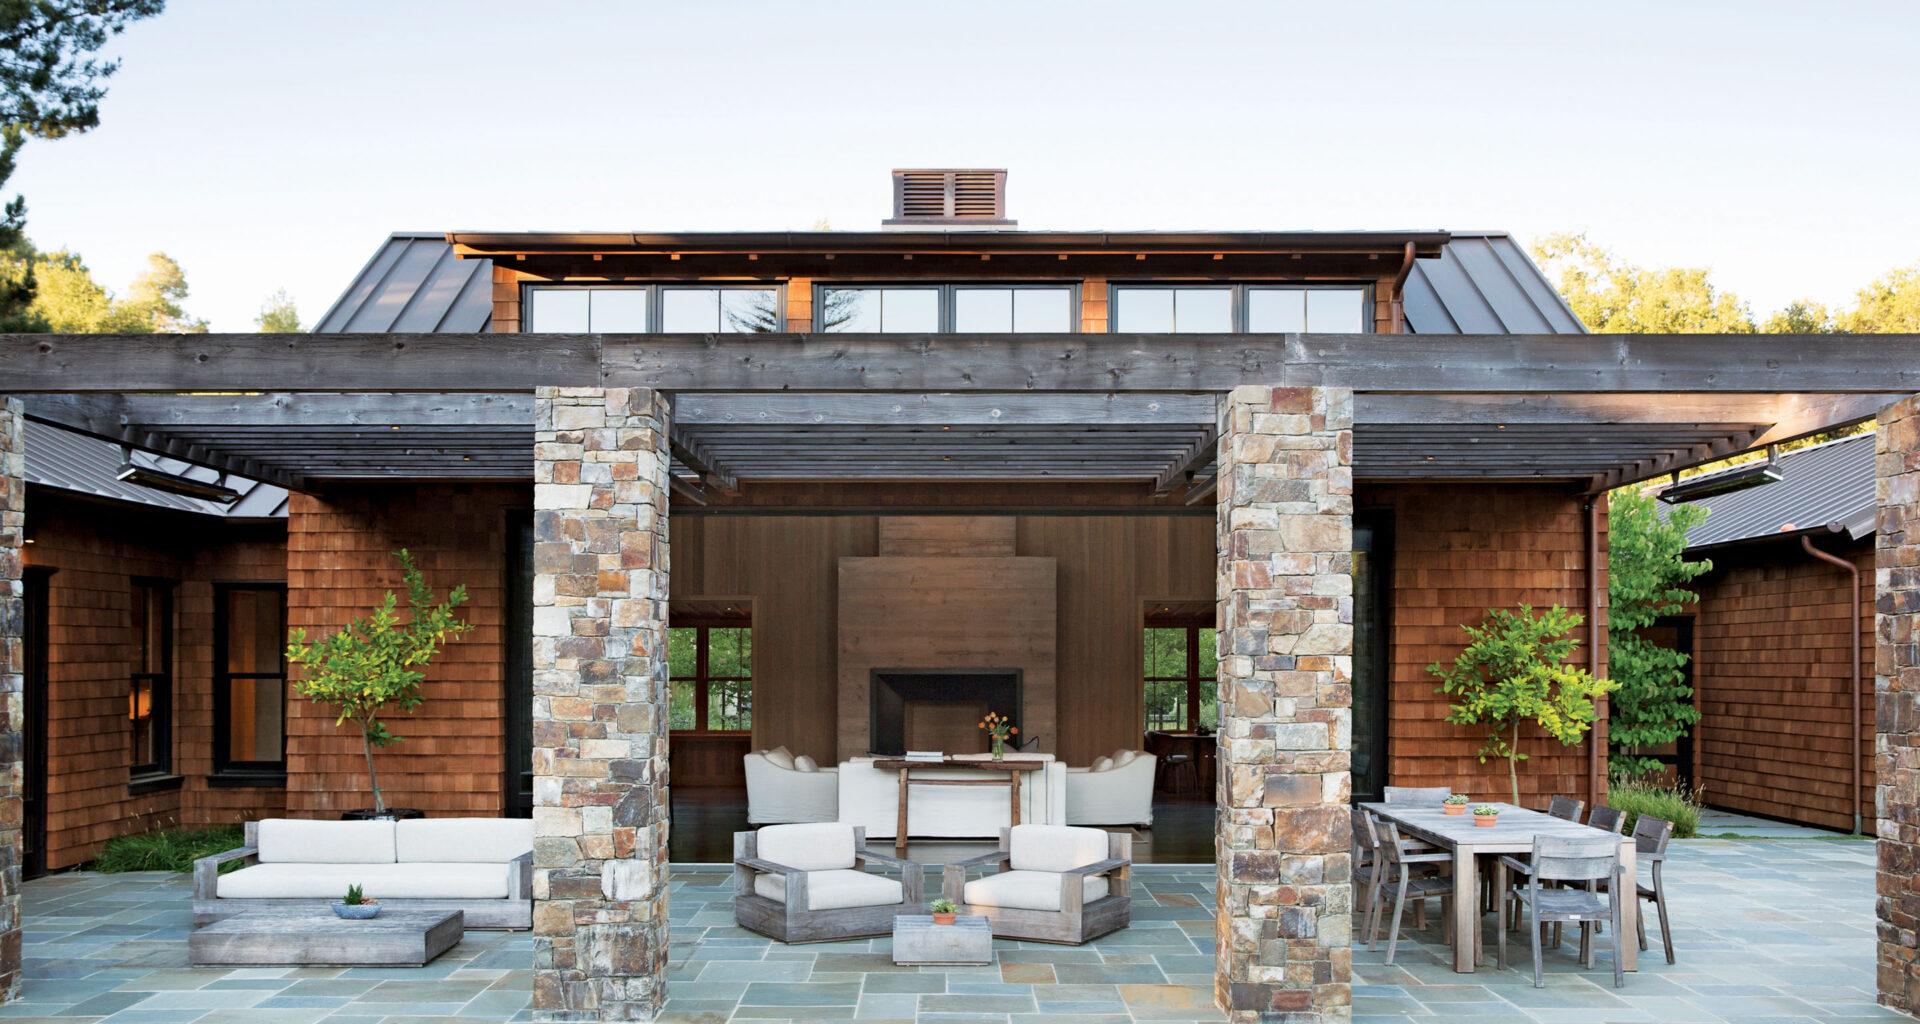 Richard Beard, Bar Architects, Portola Valley, Joseph Esherick, San Francisco, Silicon Valley, Vita Pehar, Westridge, William Wurster